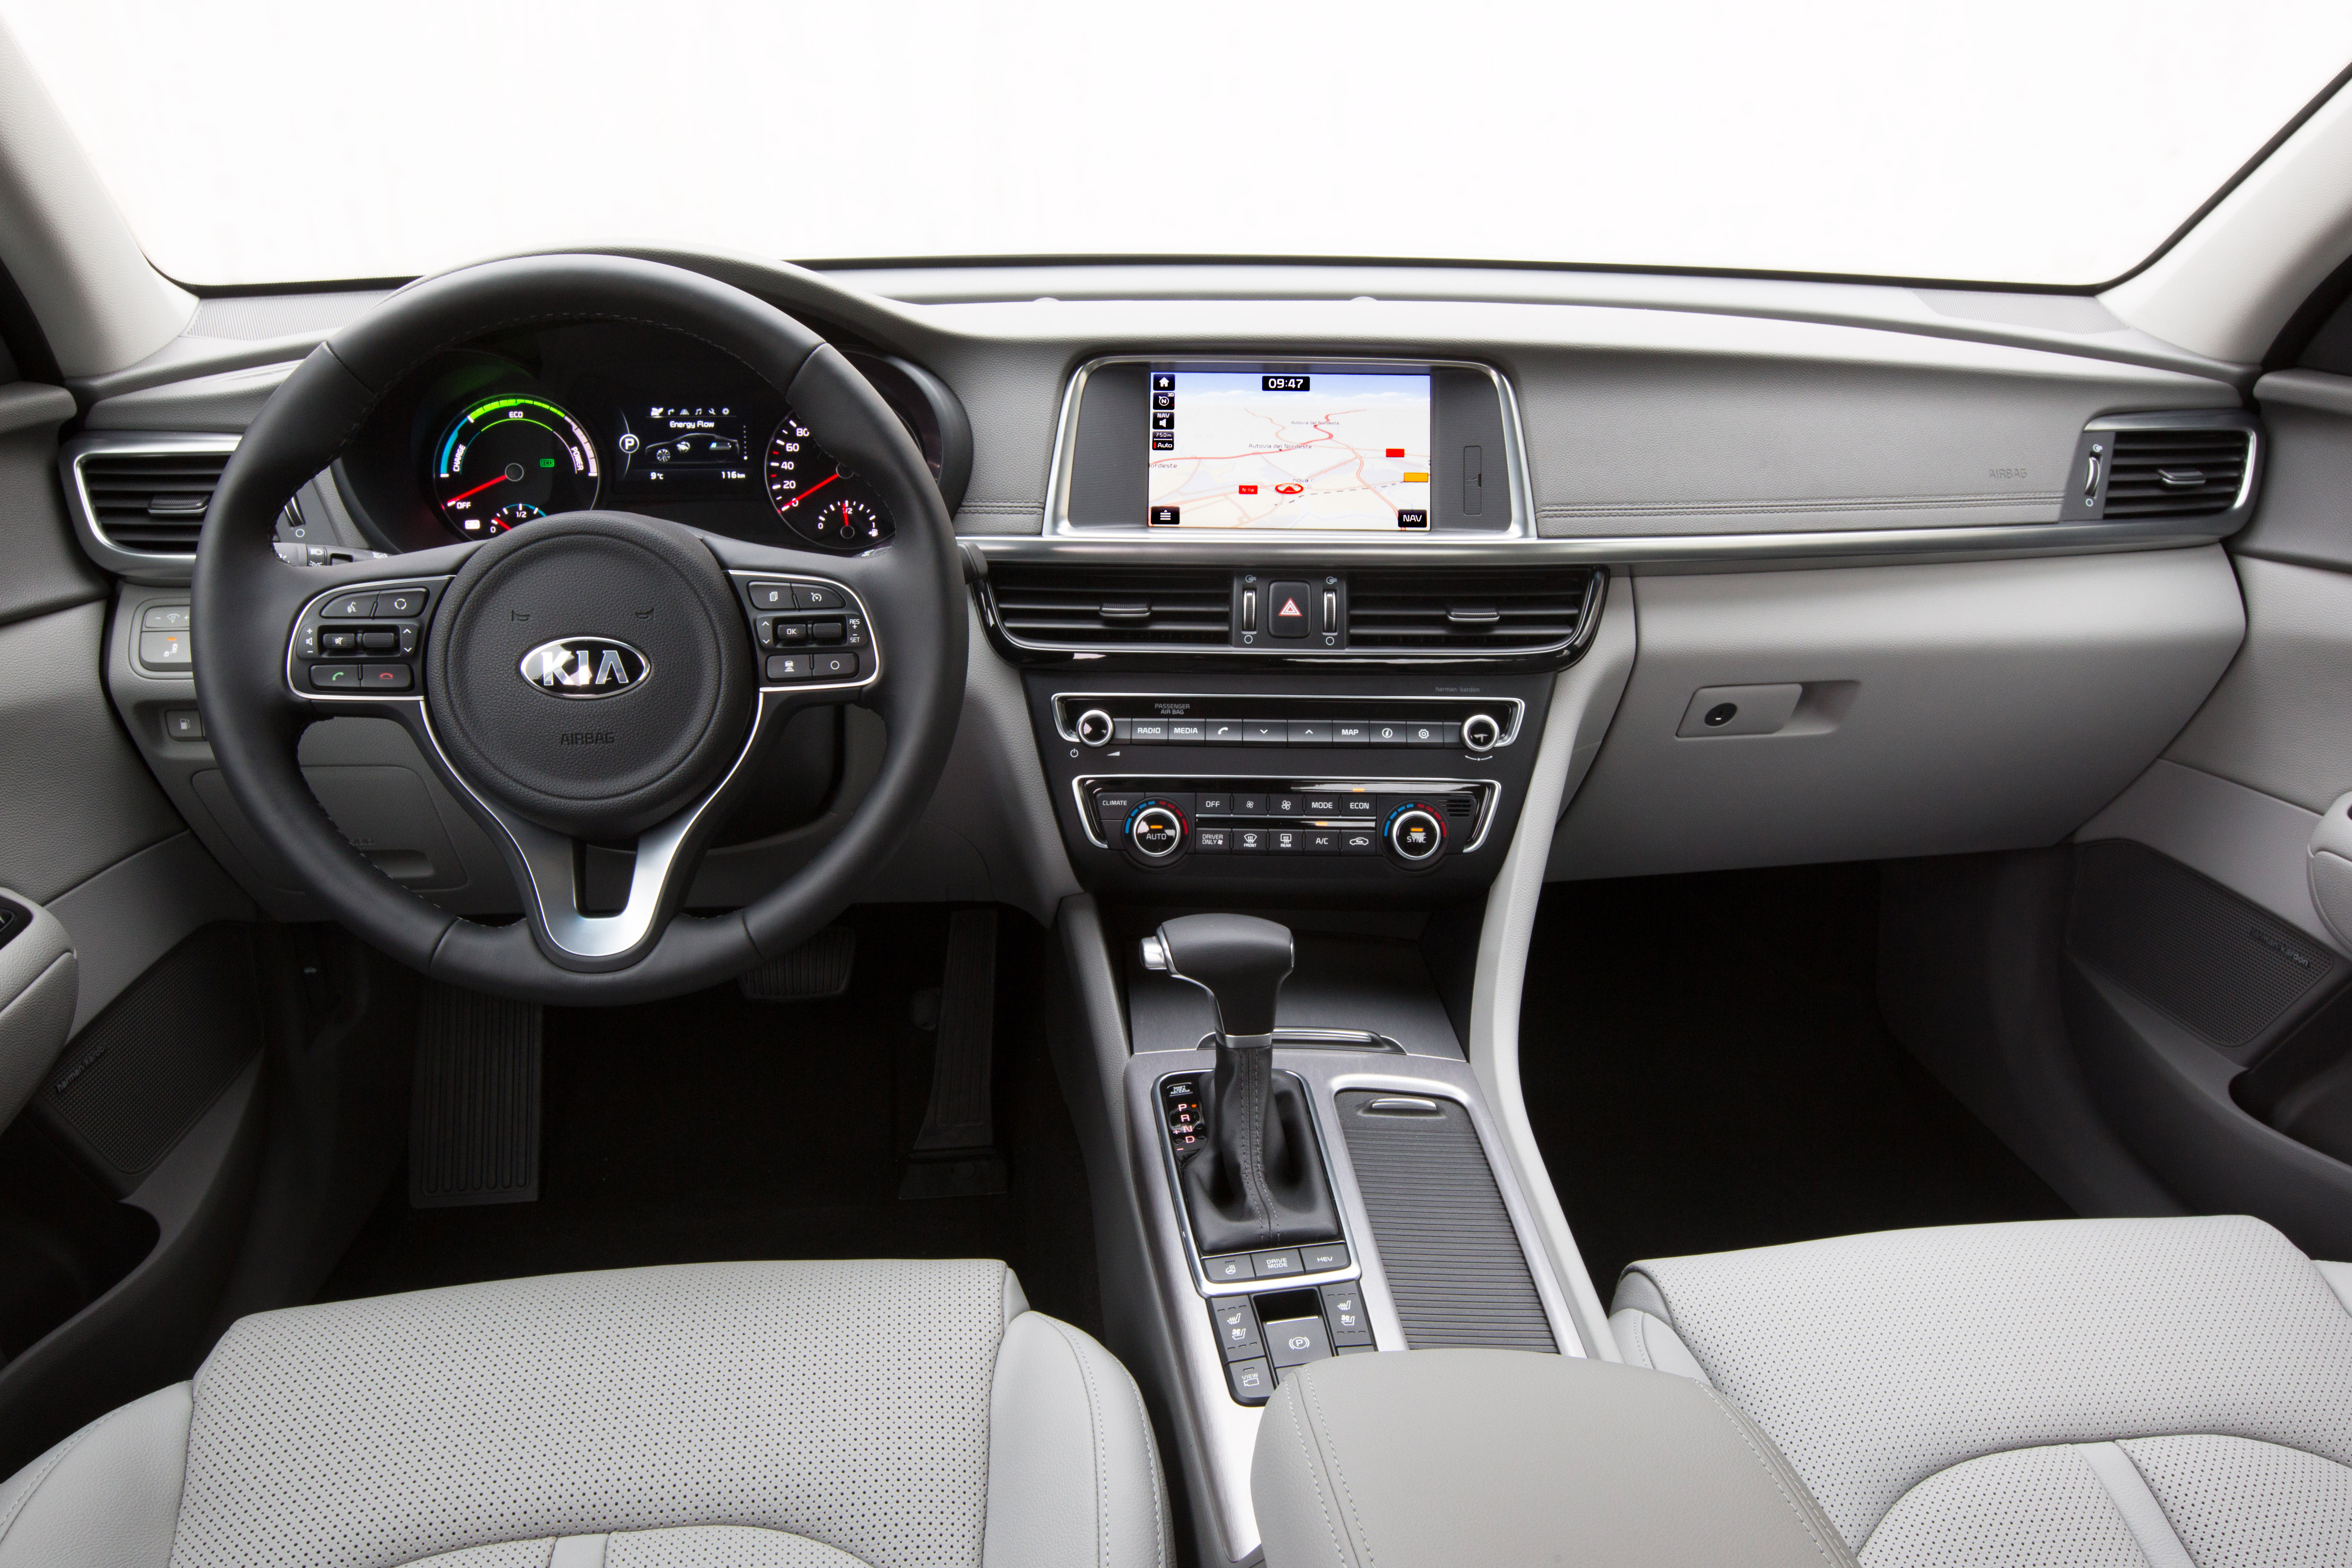 Kia Optima Plug In Hybrid Interior 01 Jpg To Cart